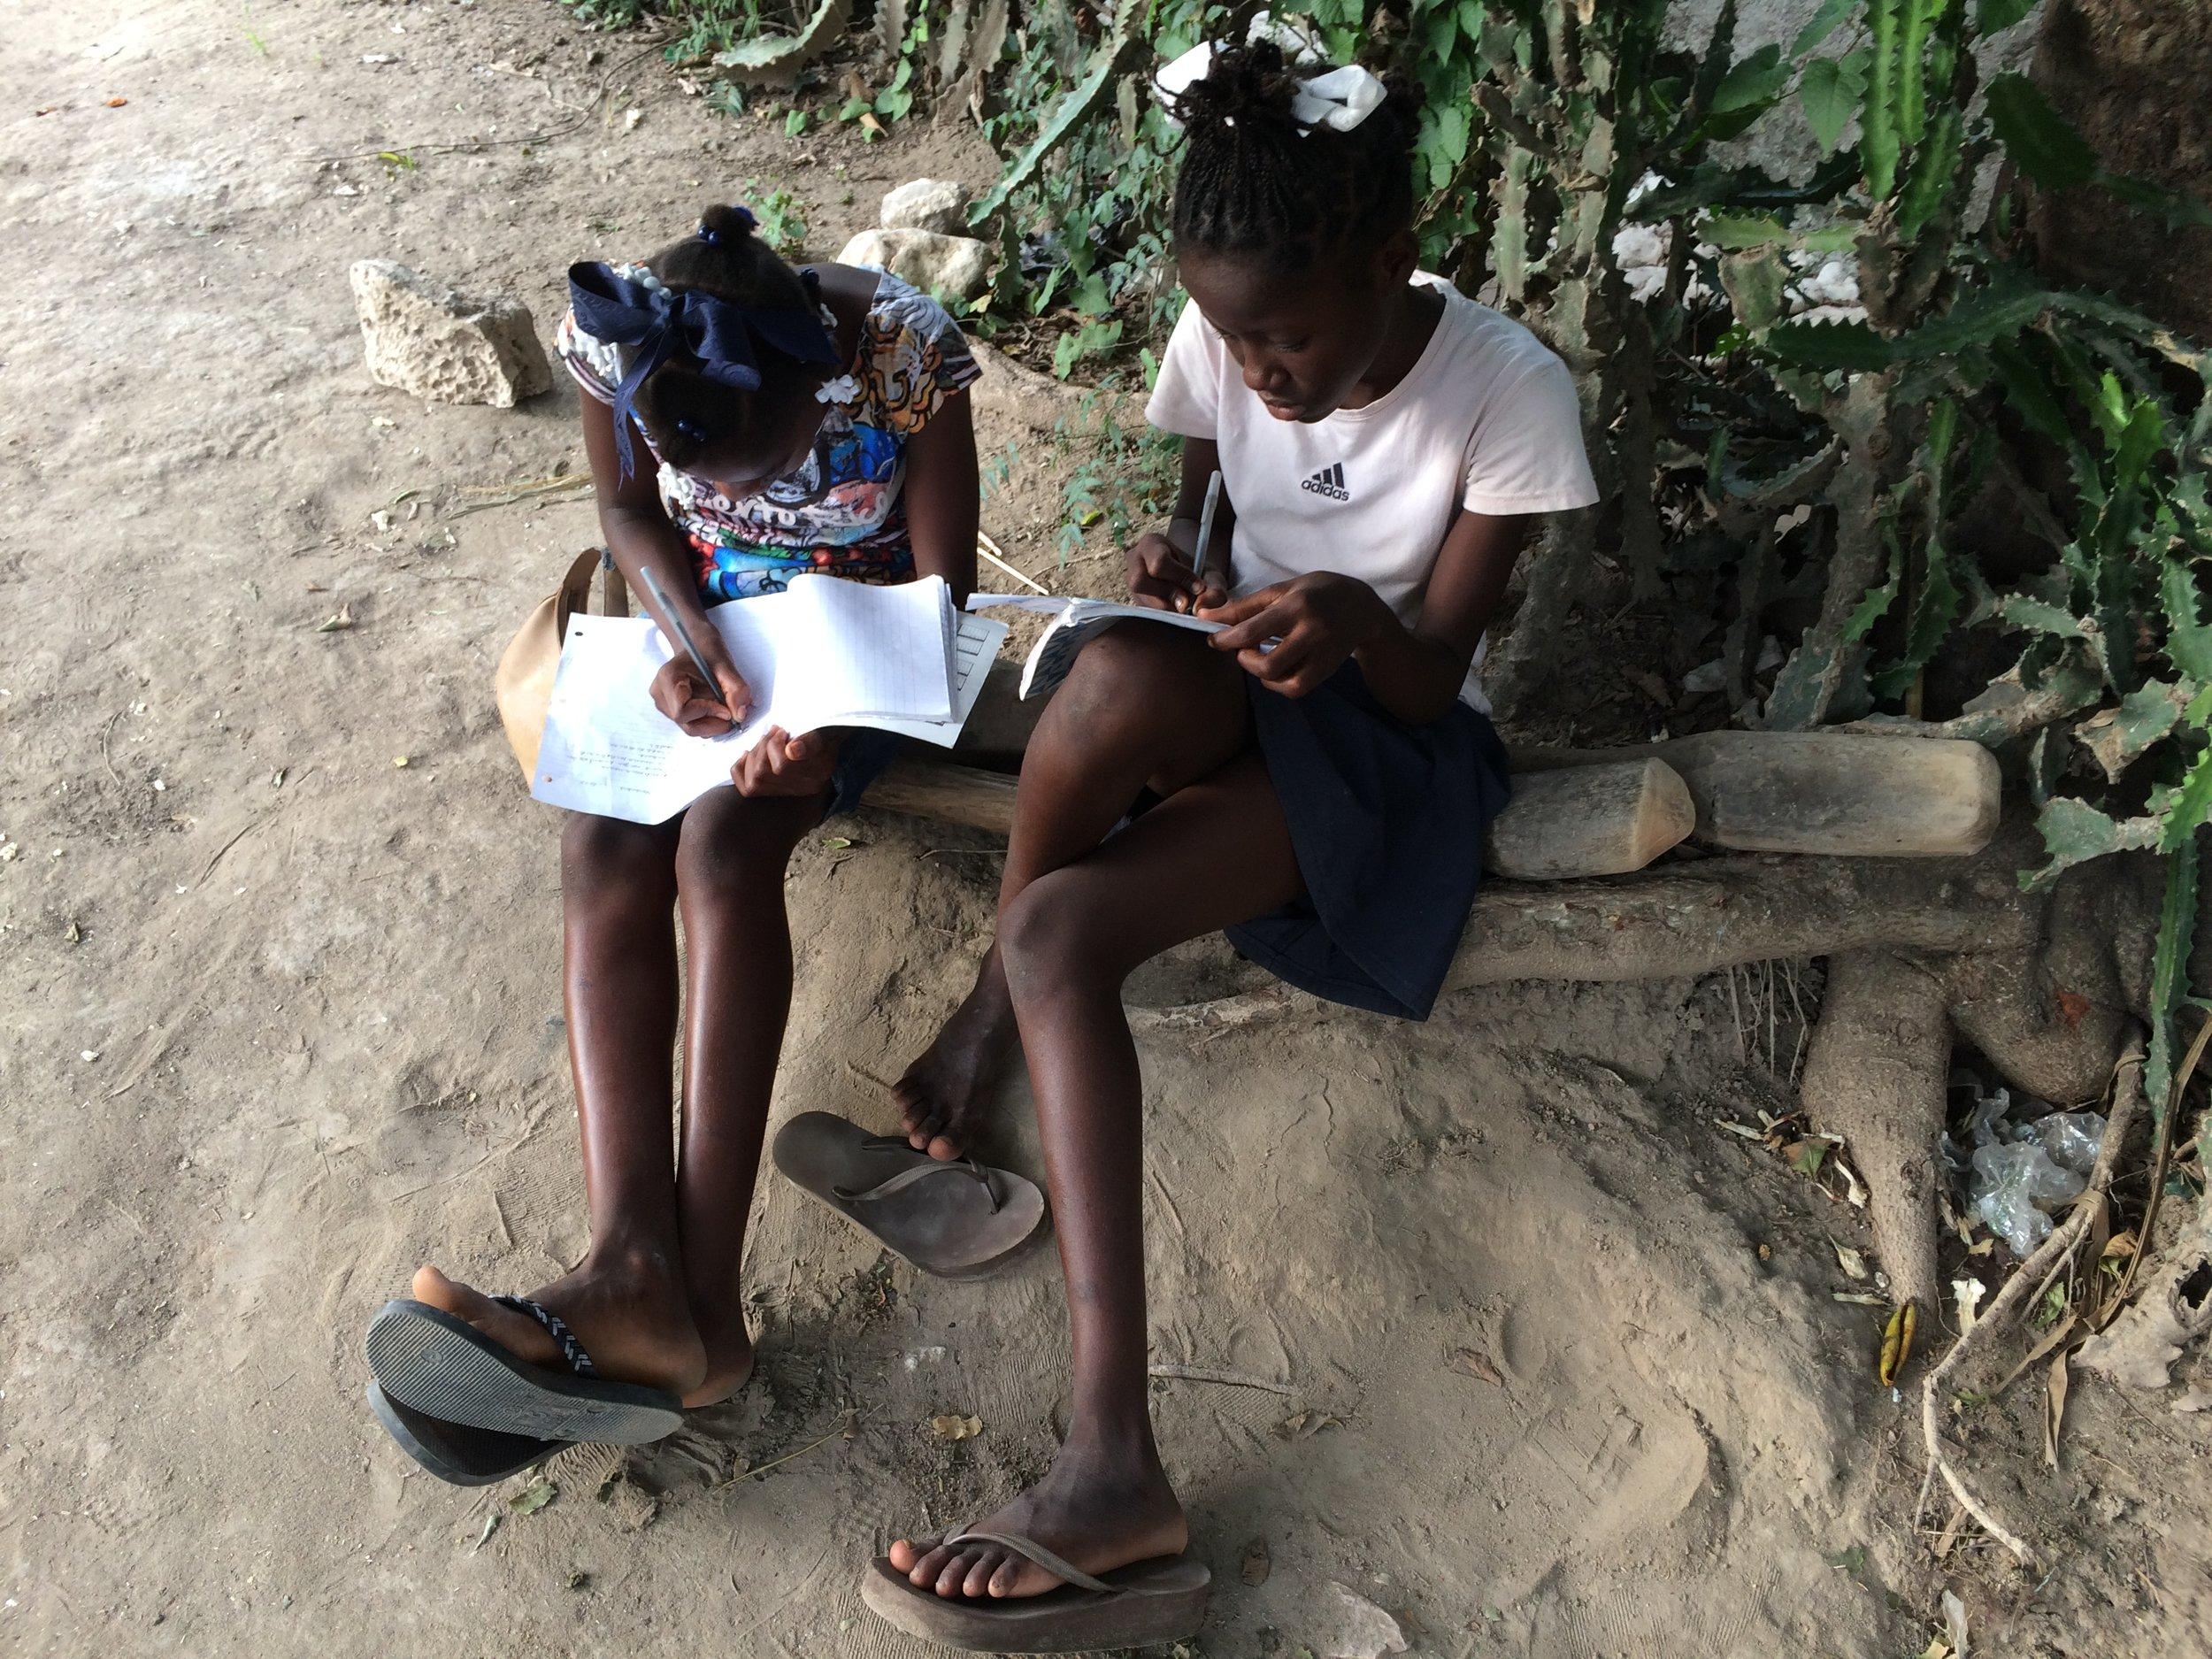 All images courtesy of Lidè Haiti.